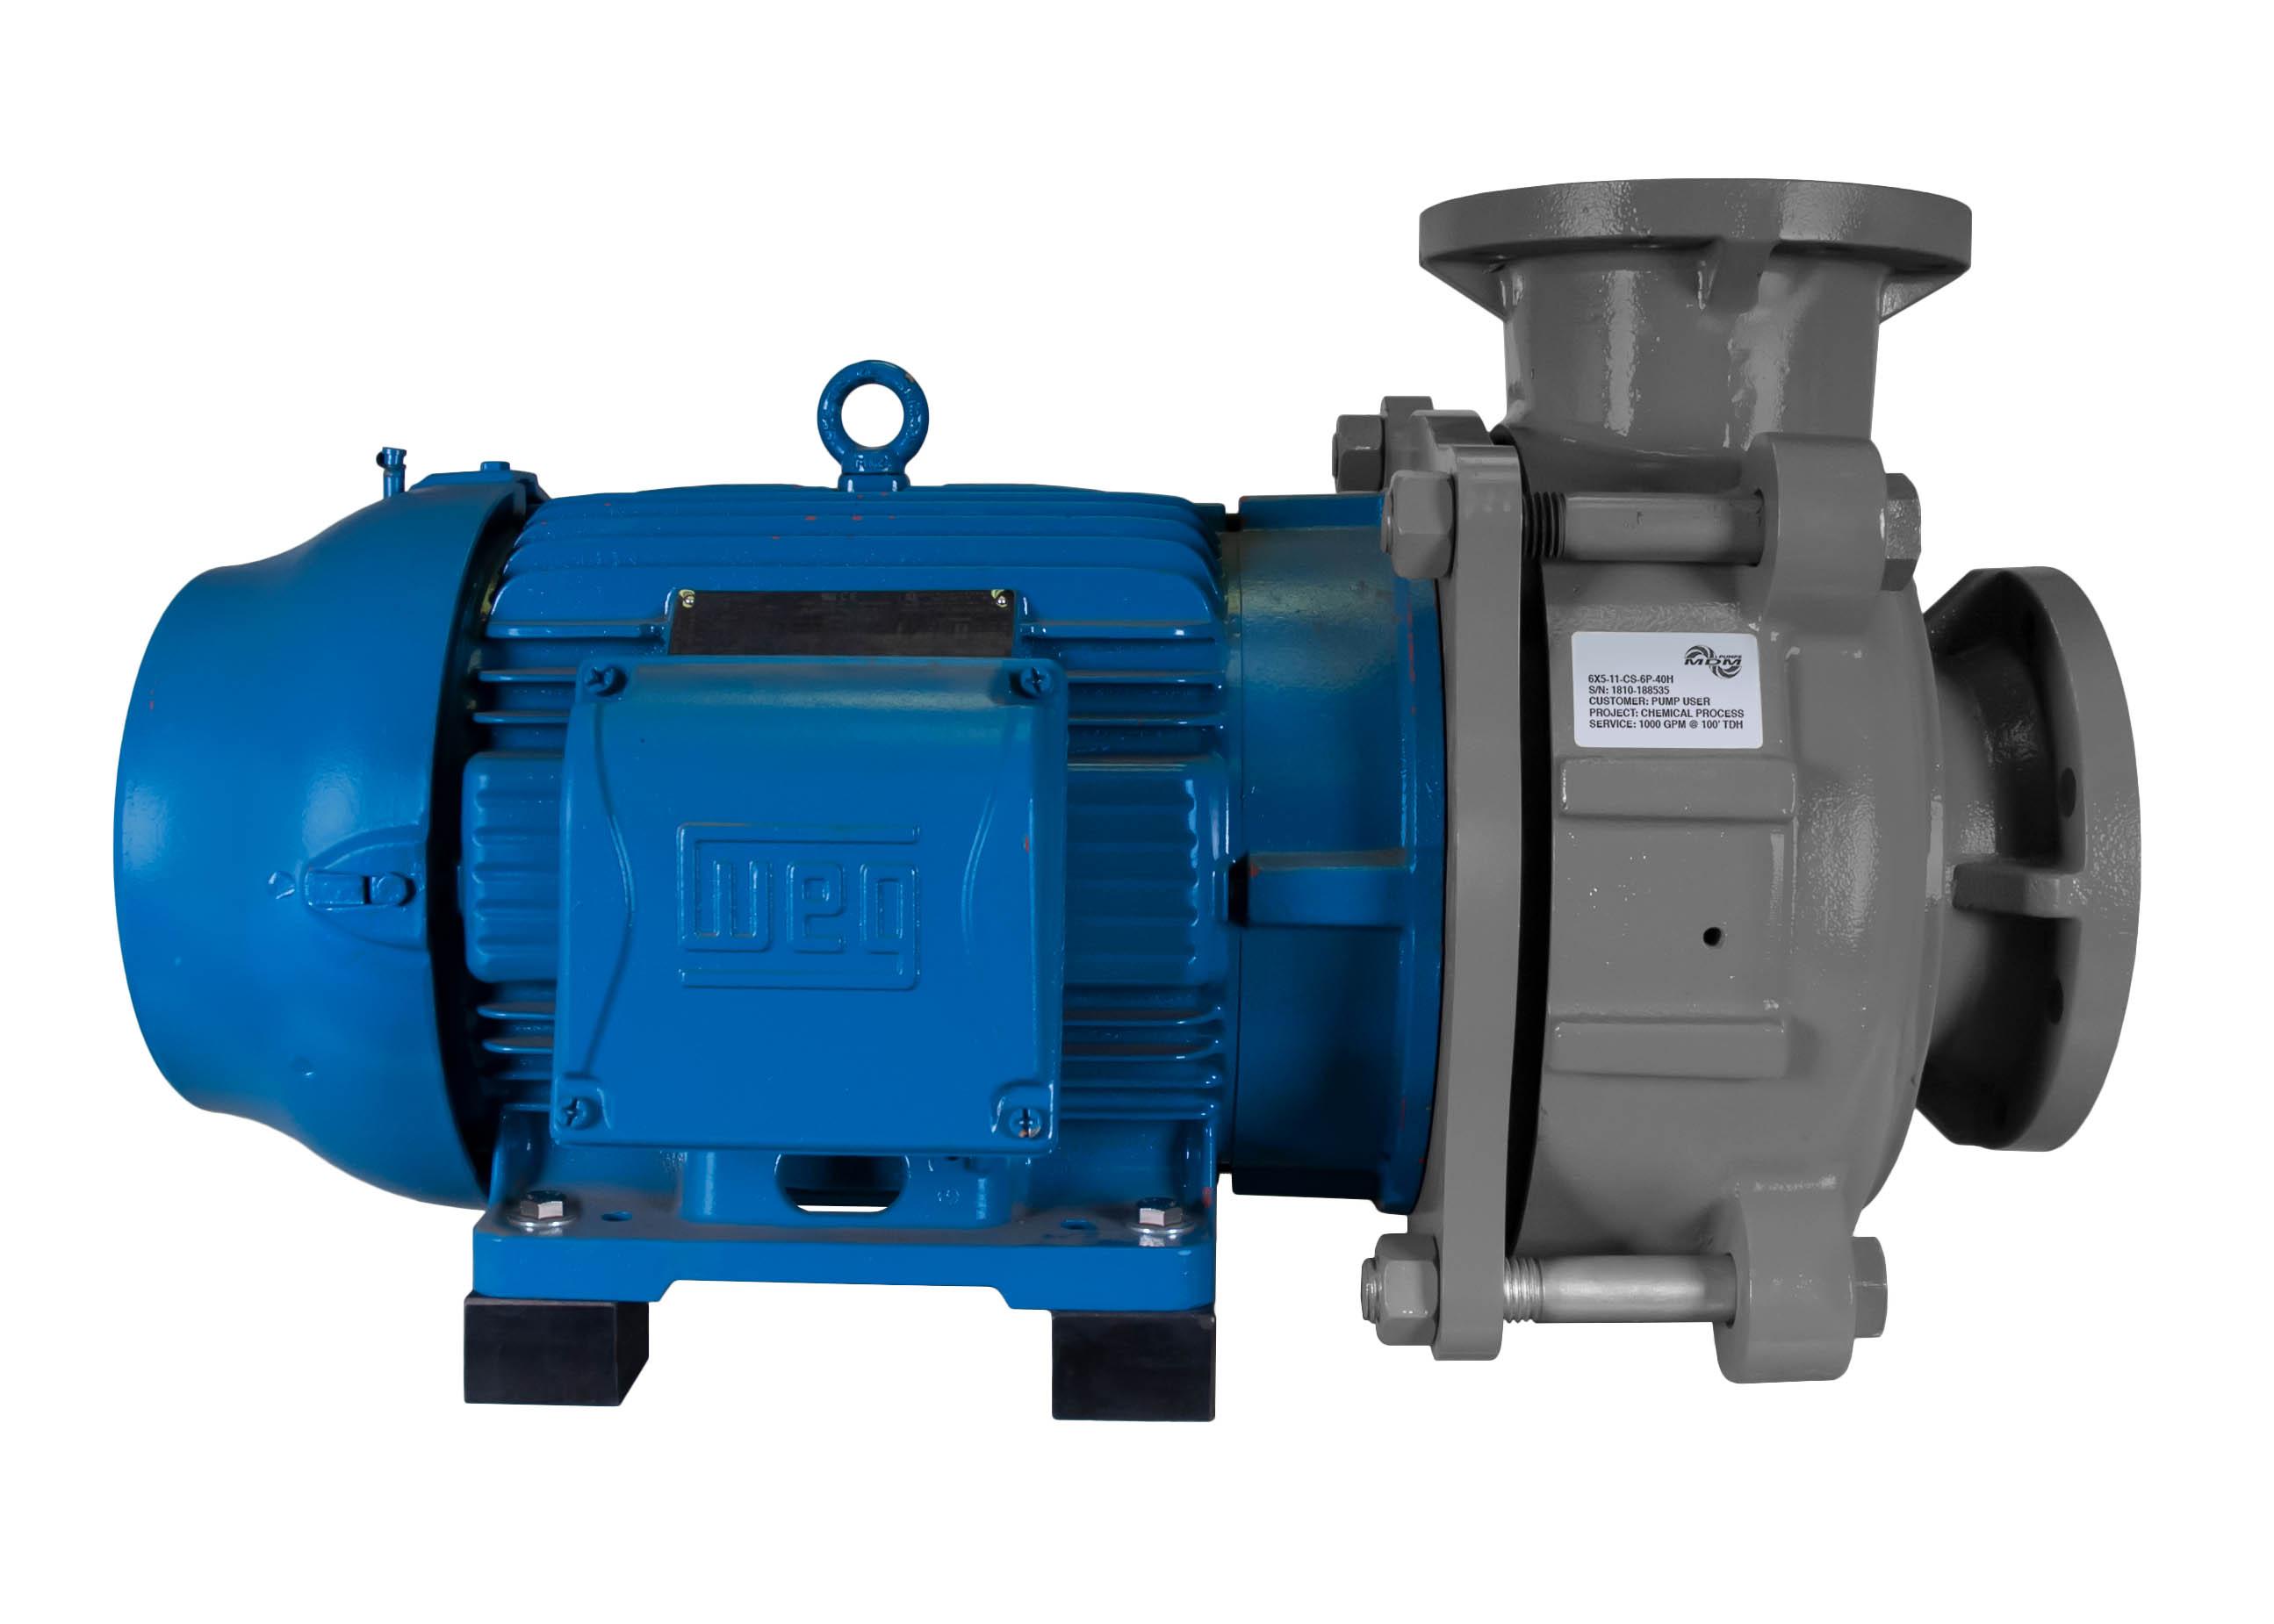 C-Shell 6x5-11 Pump with blue WEG Motor left side view